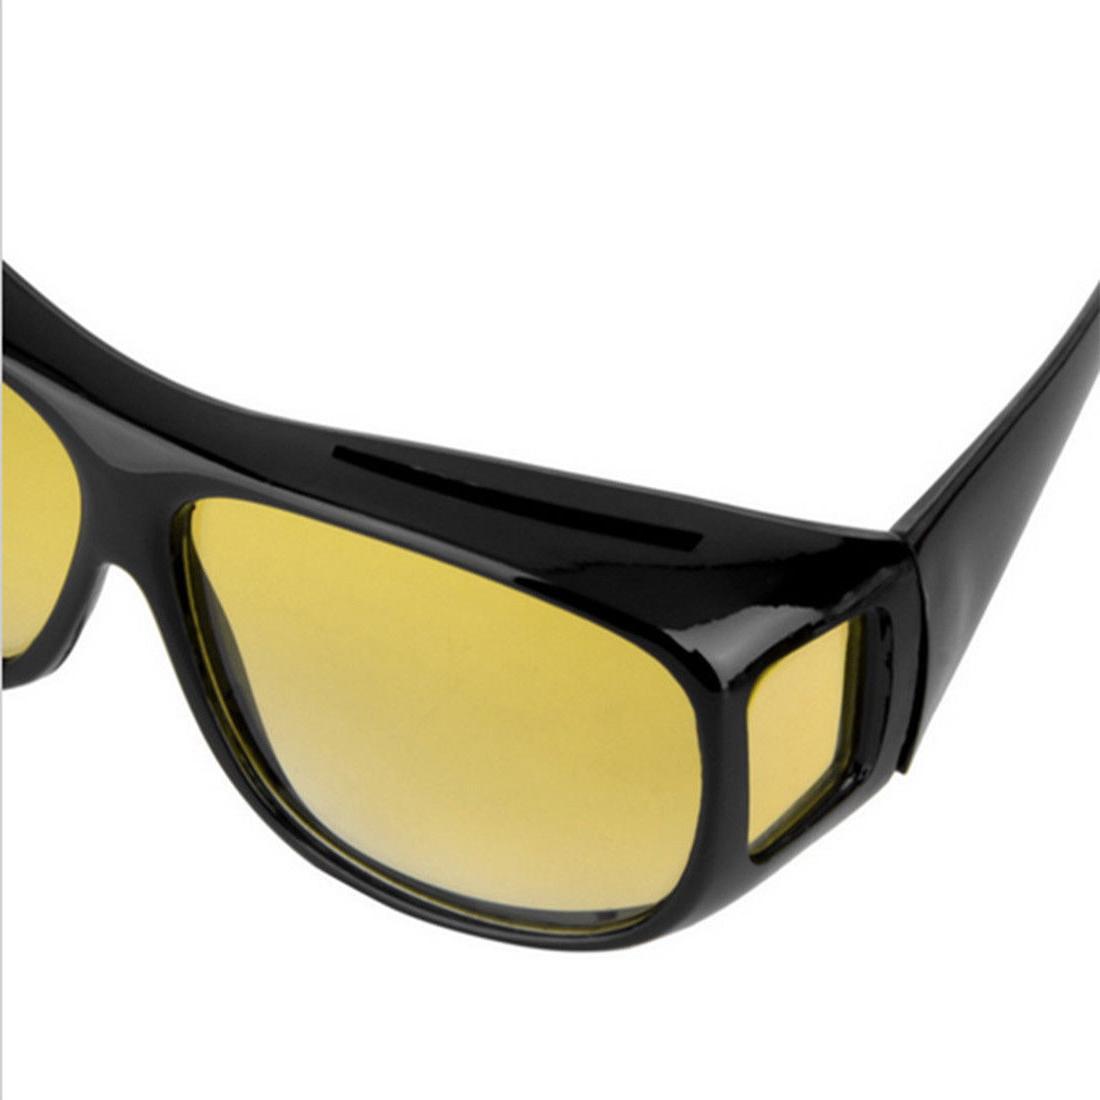 2 Pair HD Night Sunglasses Fits Glasses Seen